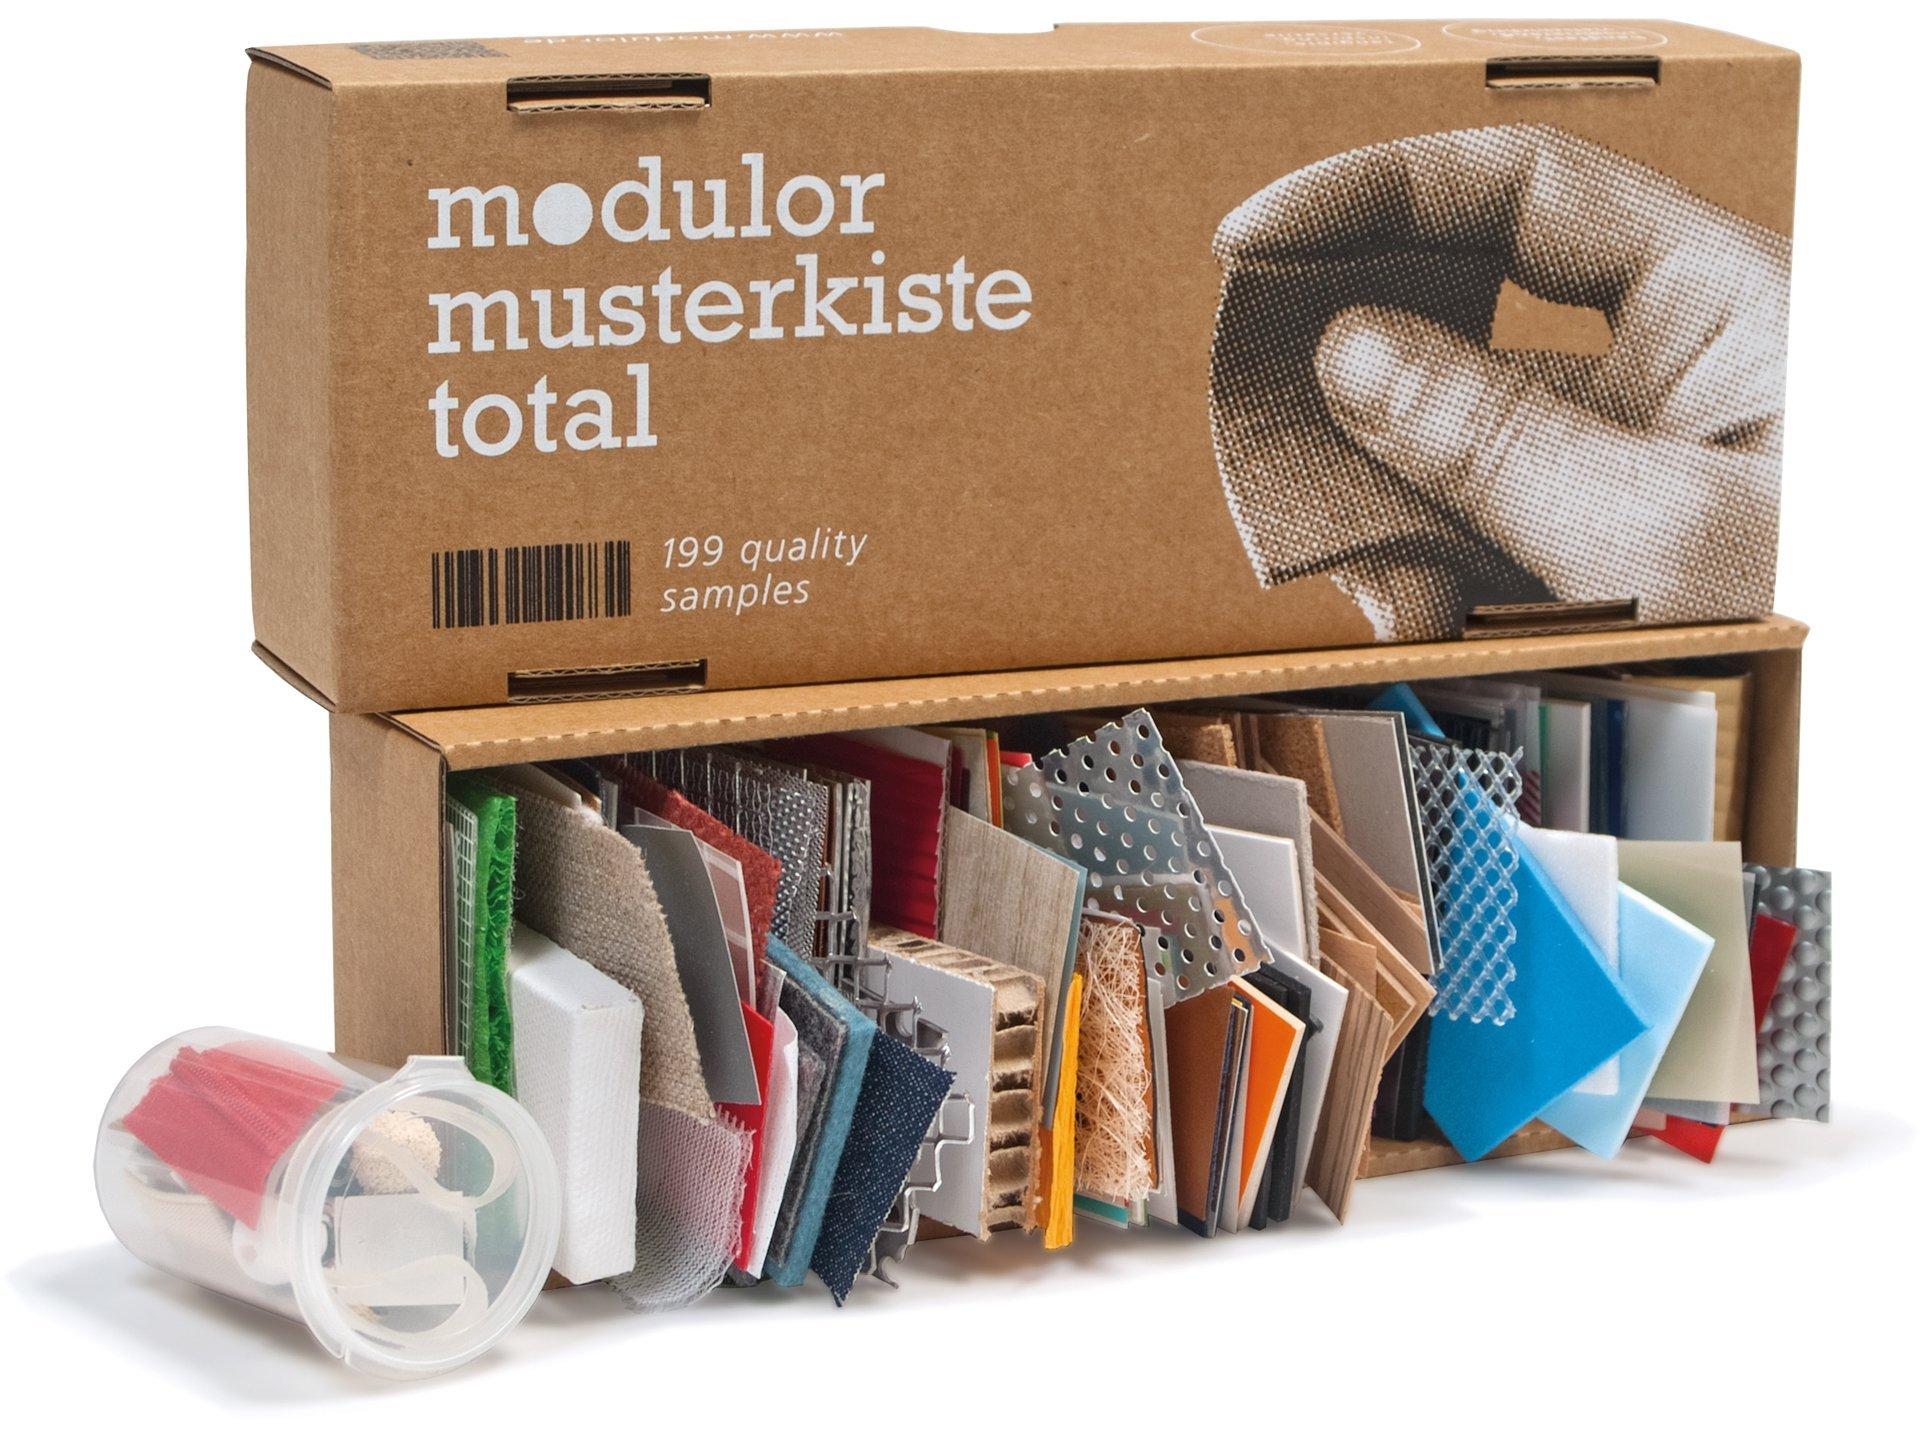 buy modulor musterkiste online at modulor online shop